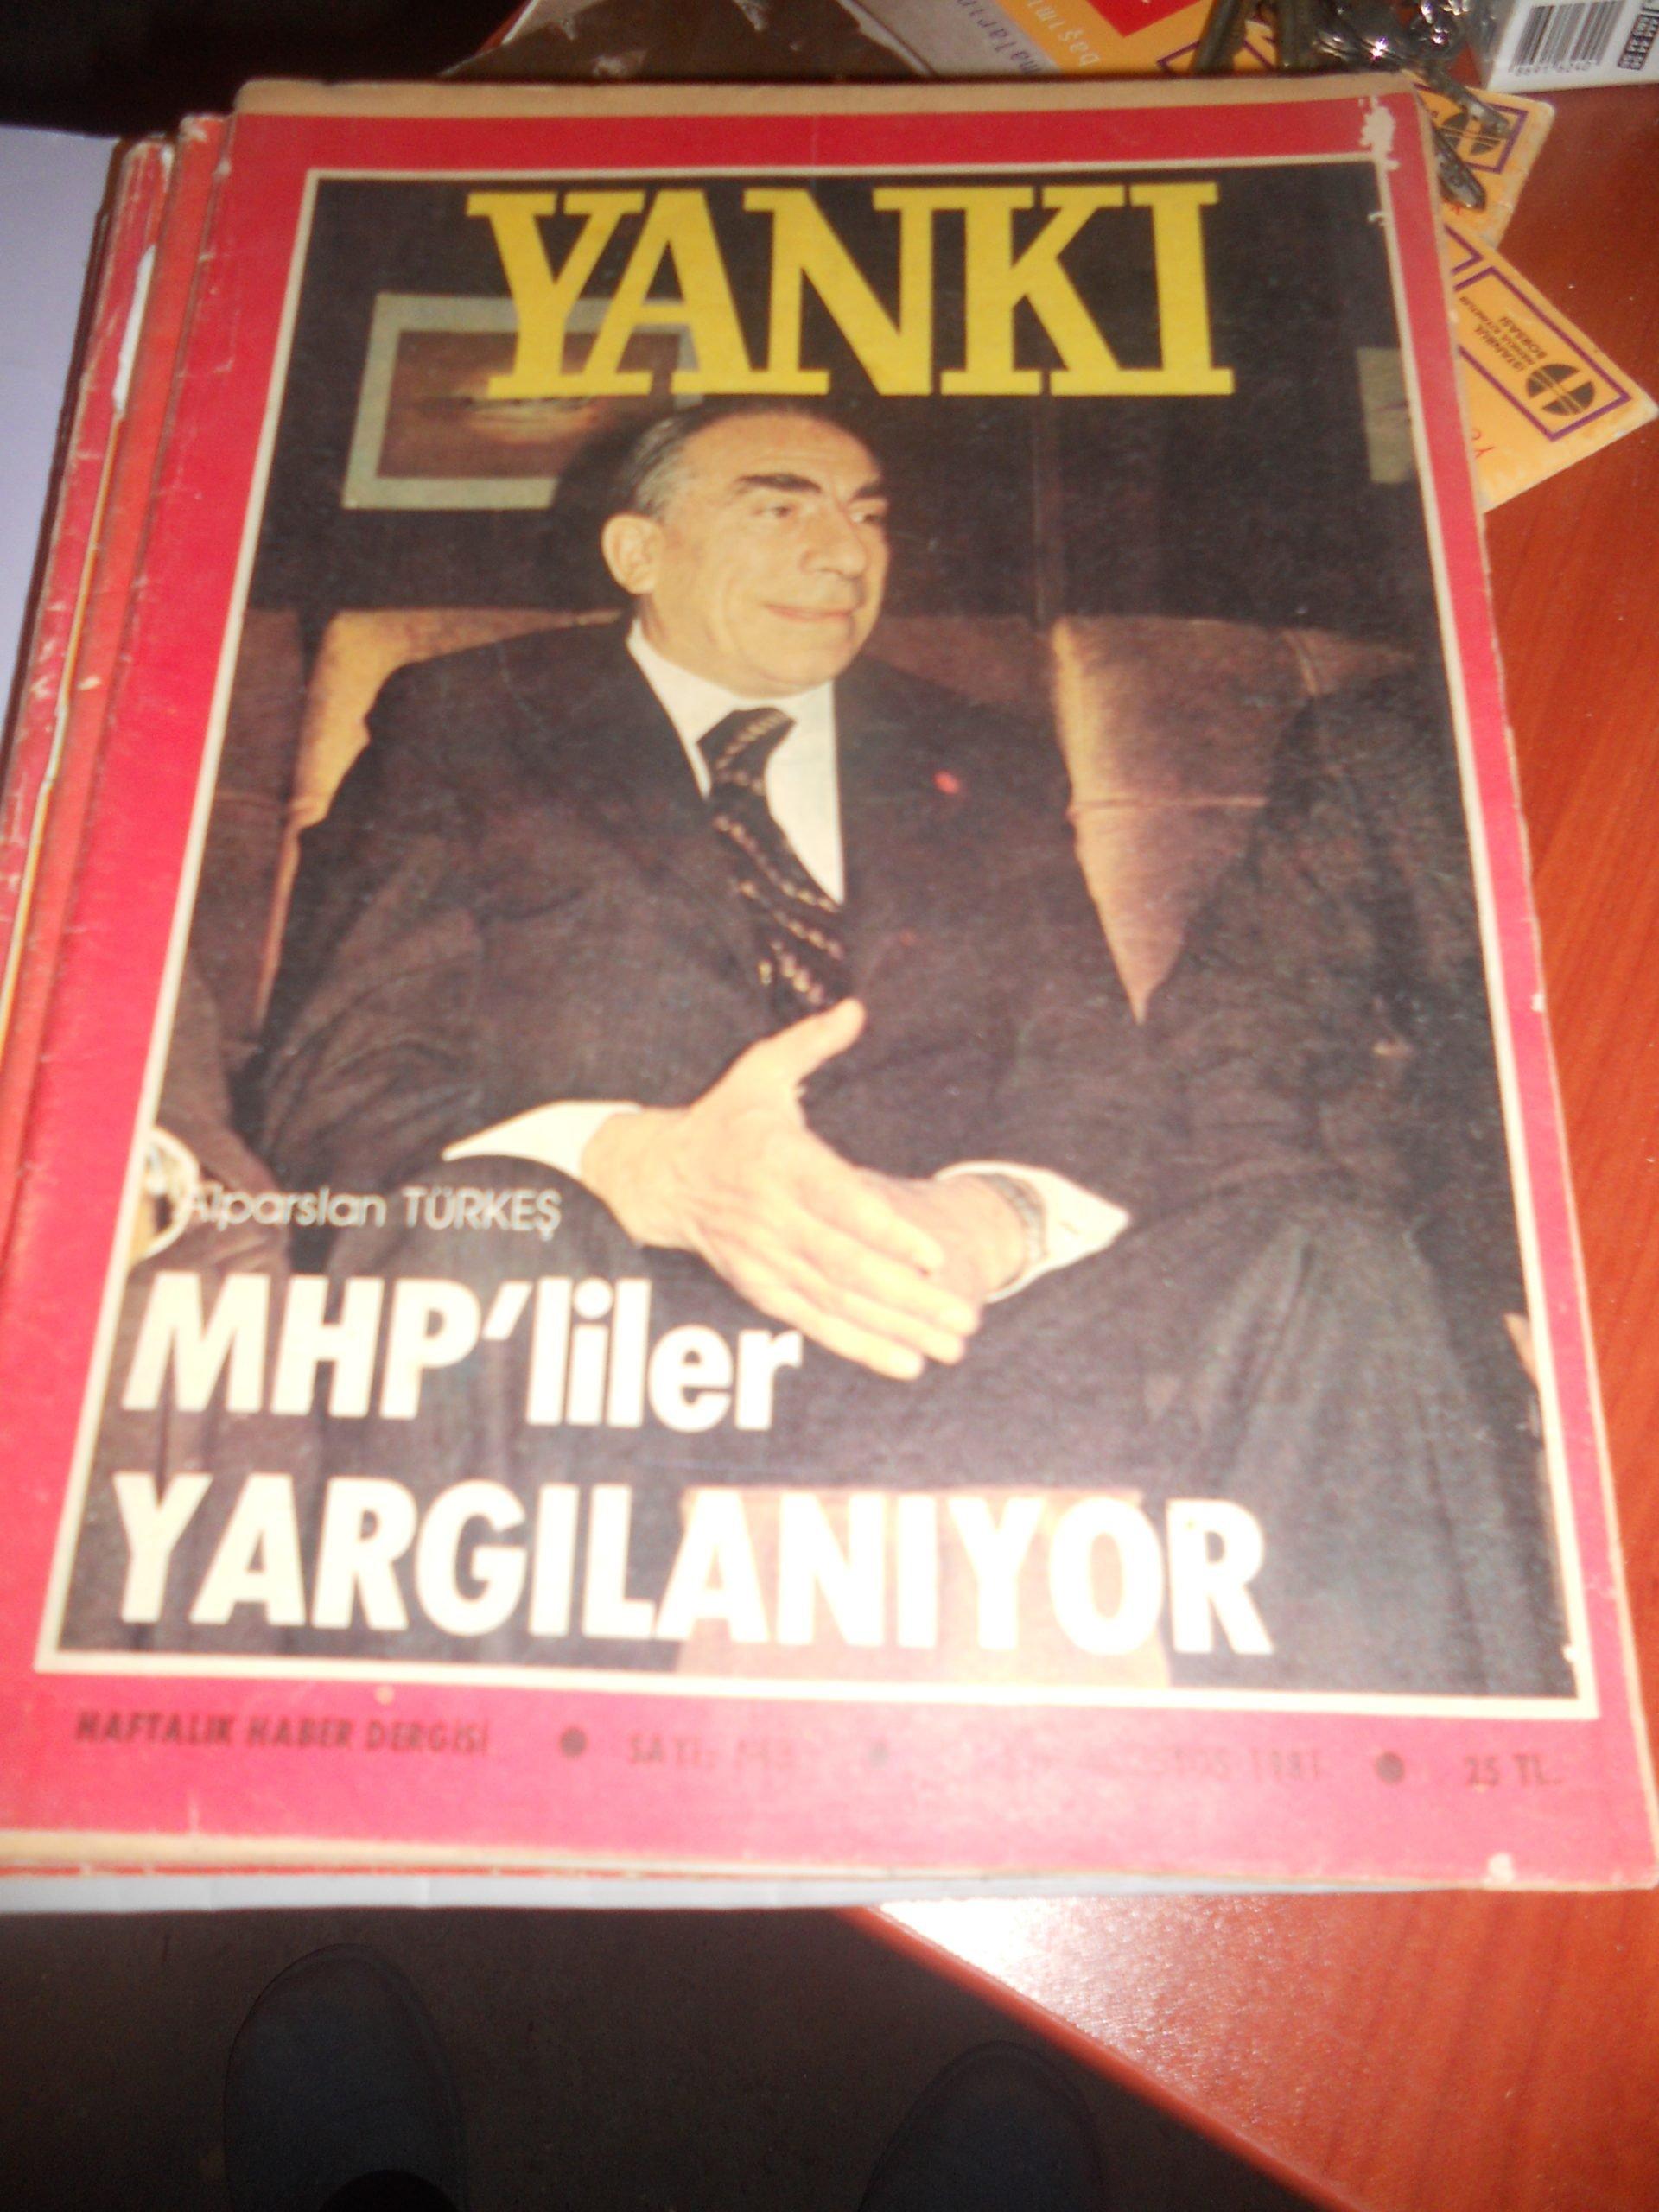 YANKI DERGİSİ/ 9 ADET/ 1980-1984 ARASI/ Toplam 45 tl